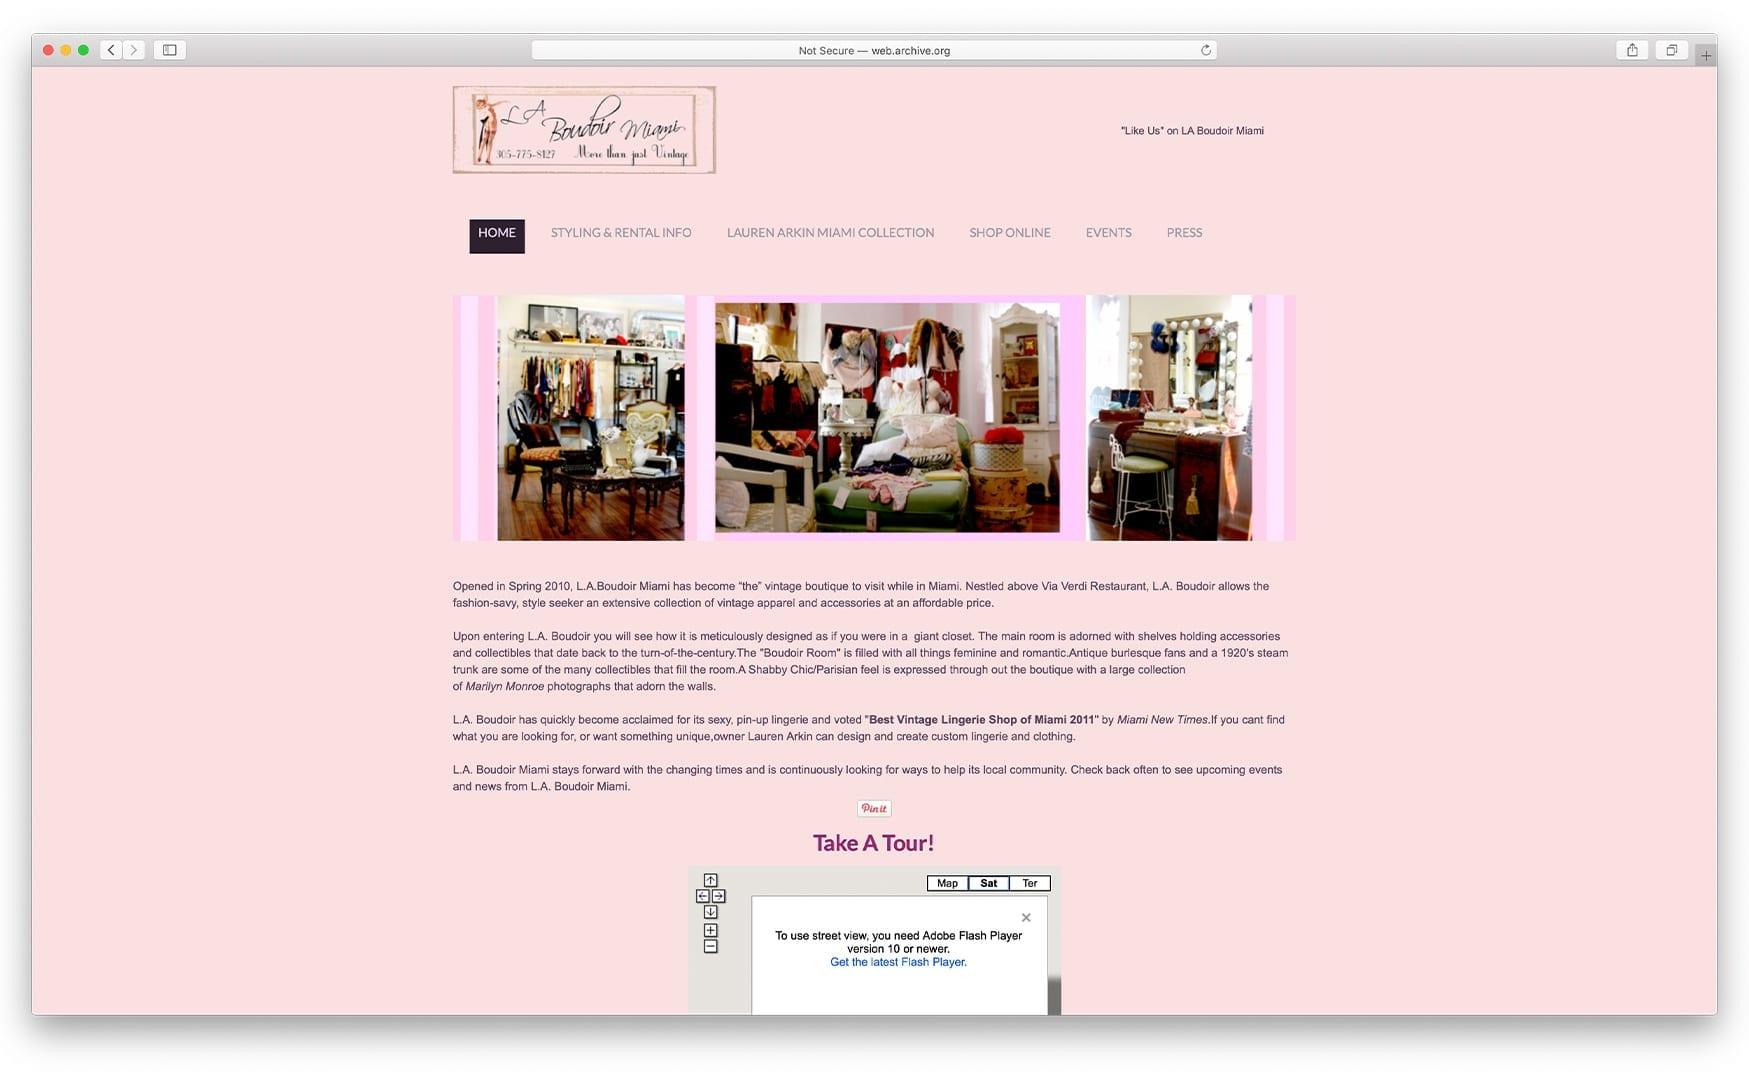 Previous Website Design - laboudoirmiami.com - Online Store Built with bizProWeb   Miami